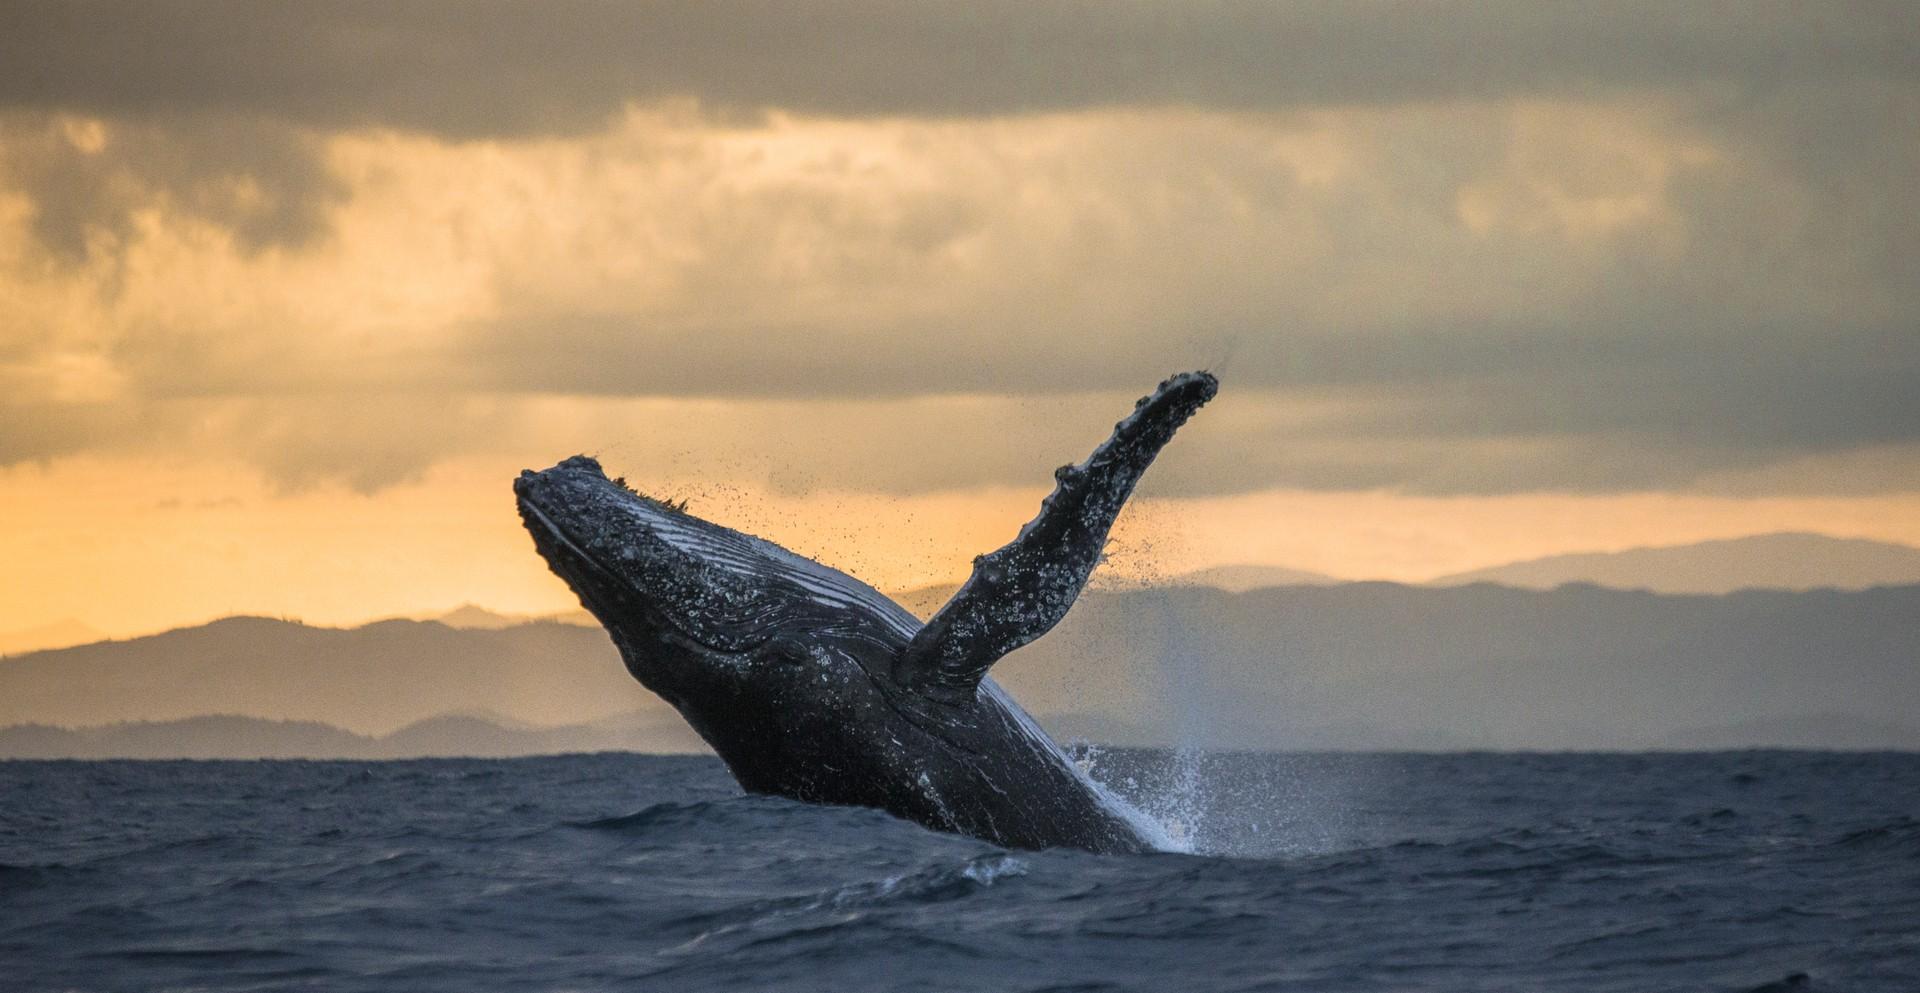 Humpback whale in Madagascar